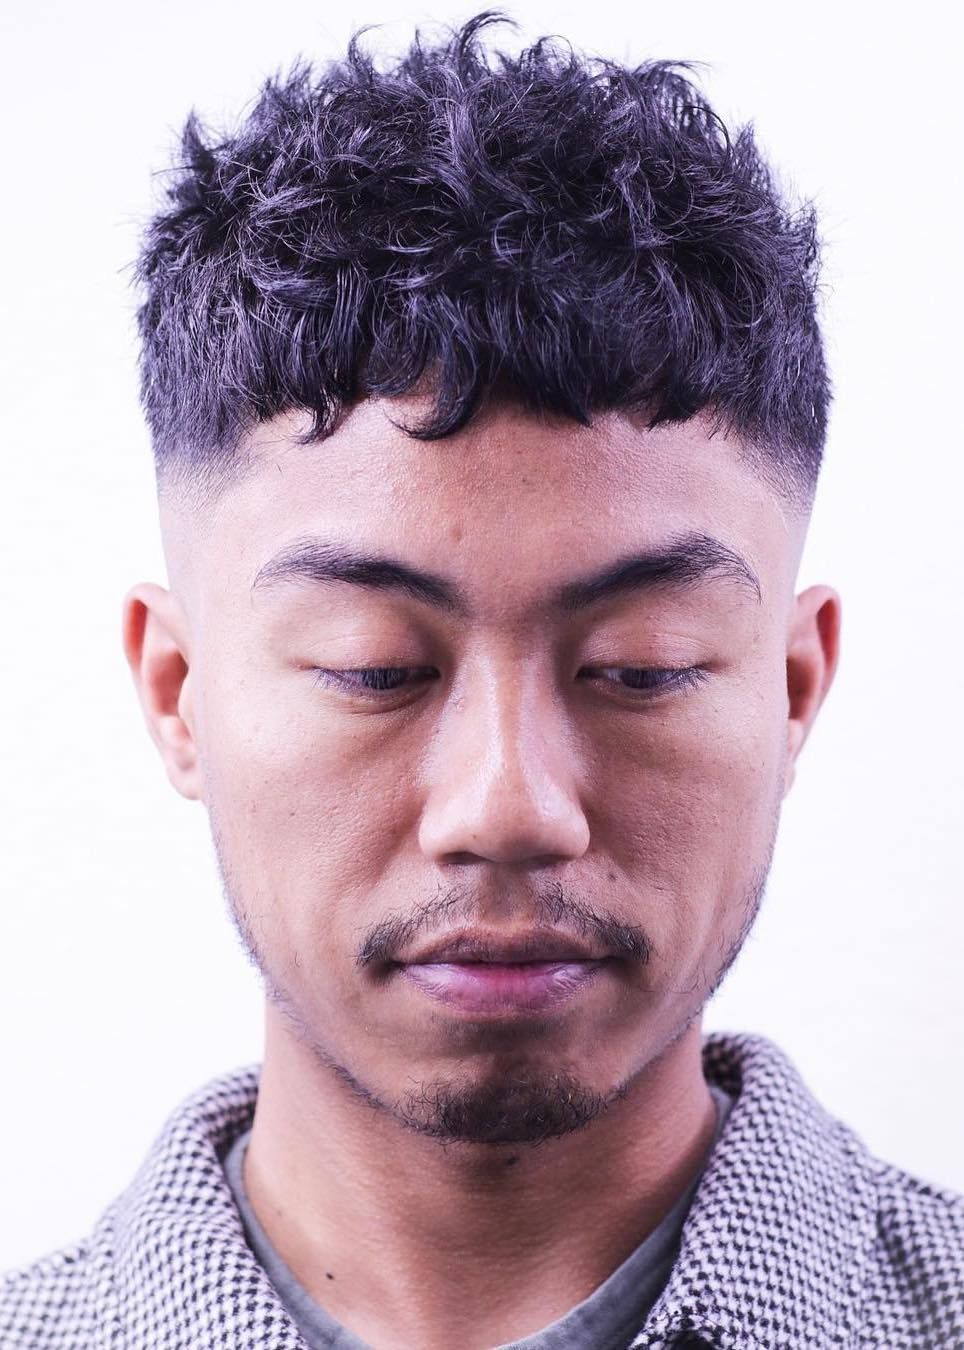 Top 30 Trendy Asian Men Hairstyles 2020 Asian Men Hairstyle Asian Man Haircut Asian Hair